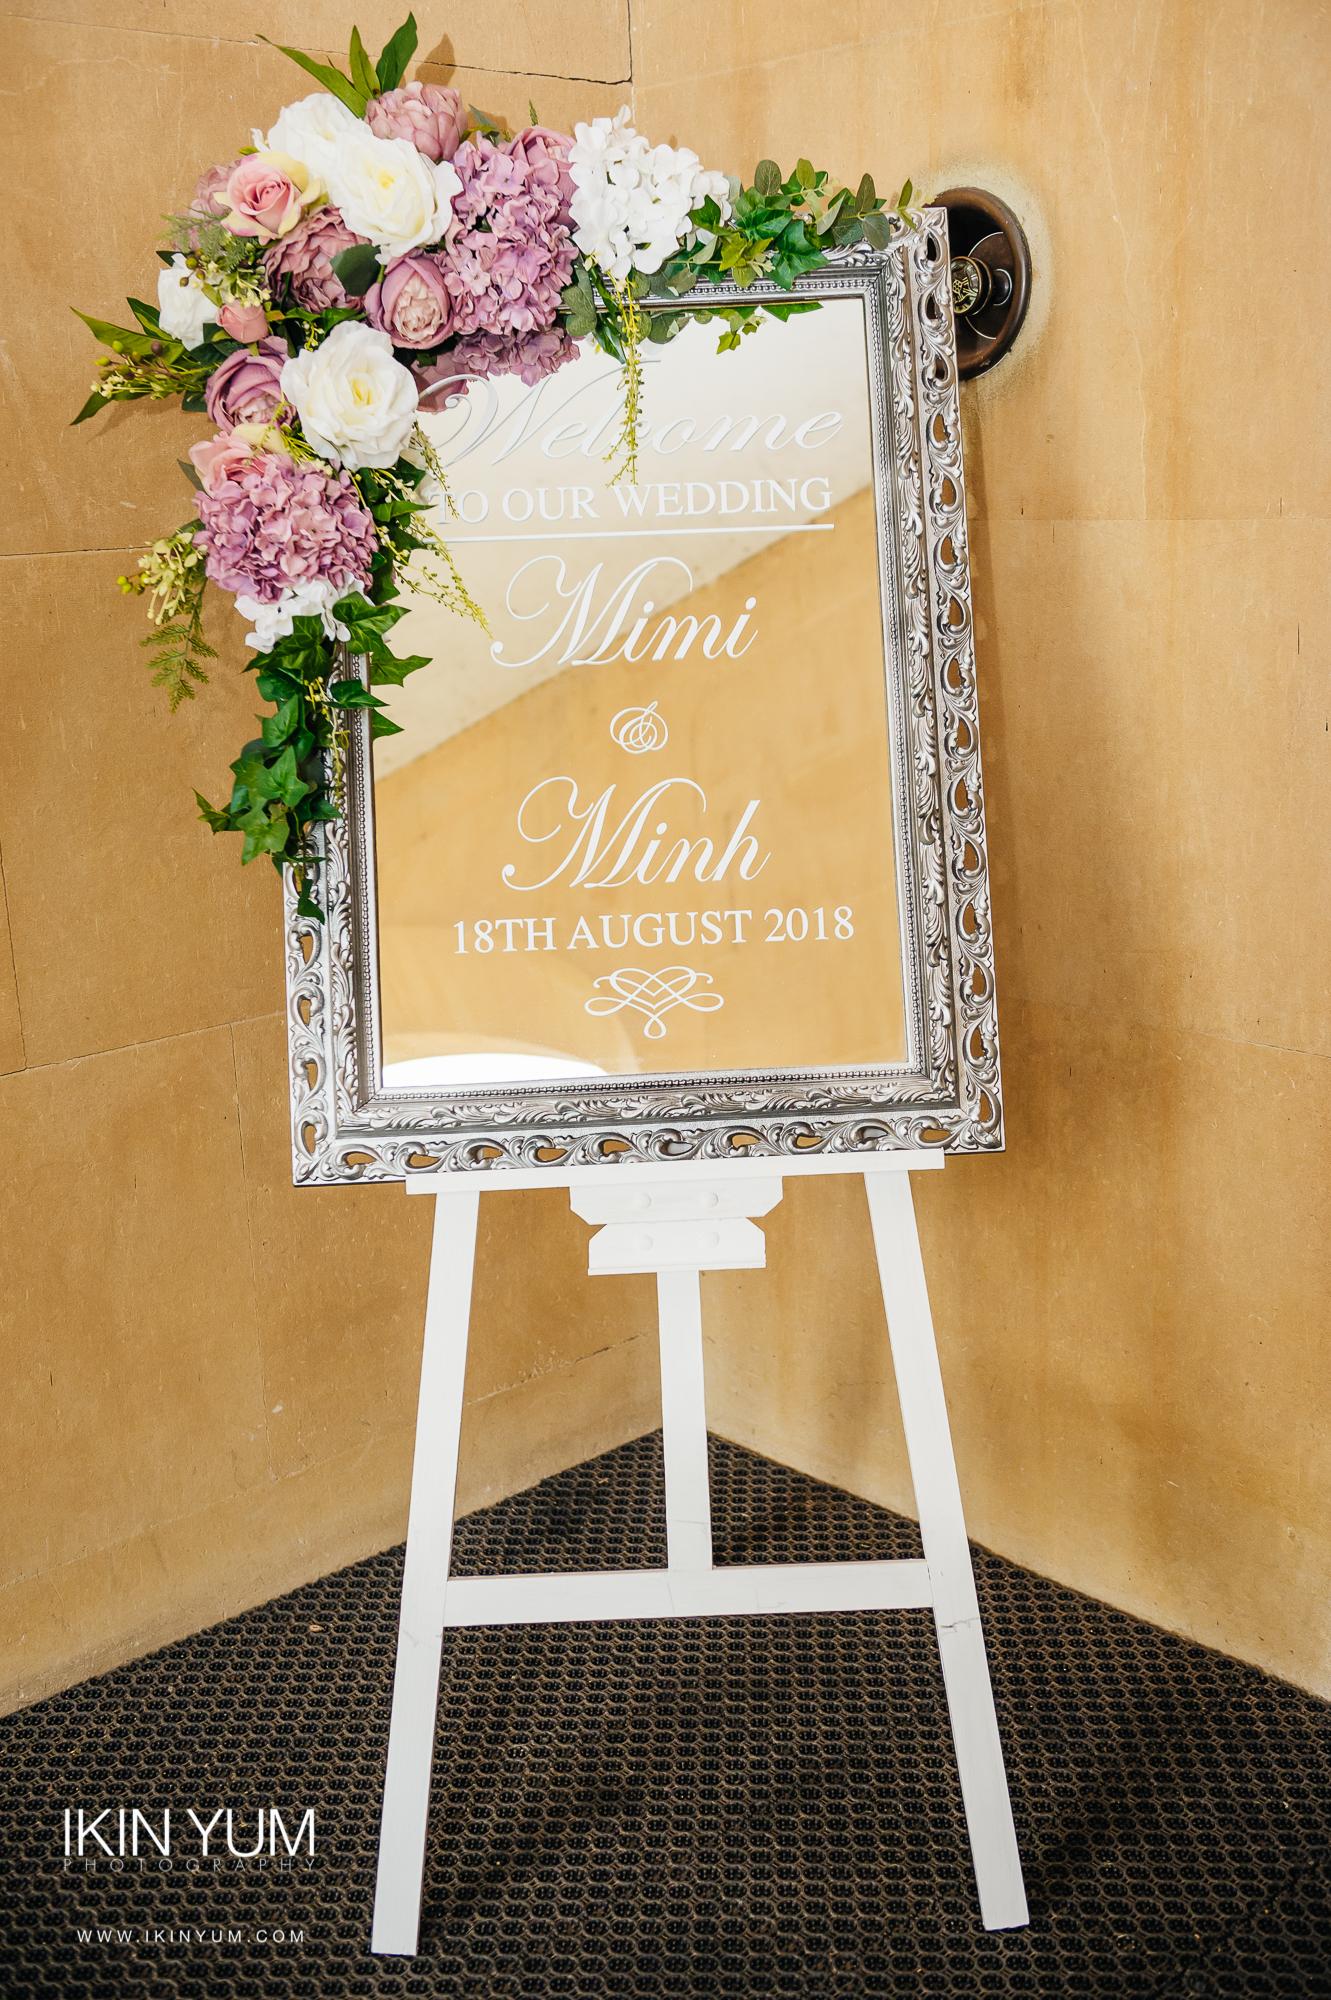 Syon Park Wedding - Ikin Yum Photography -031.jpg